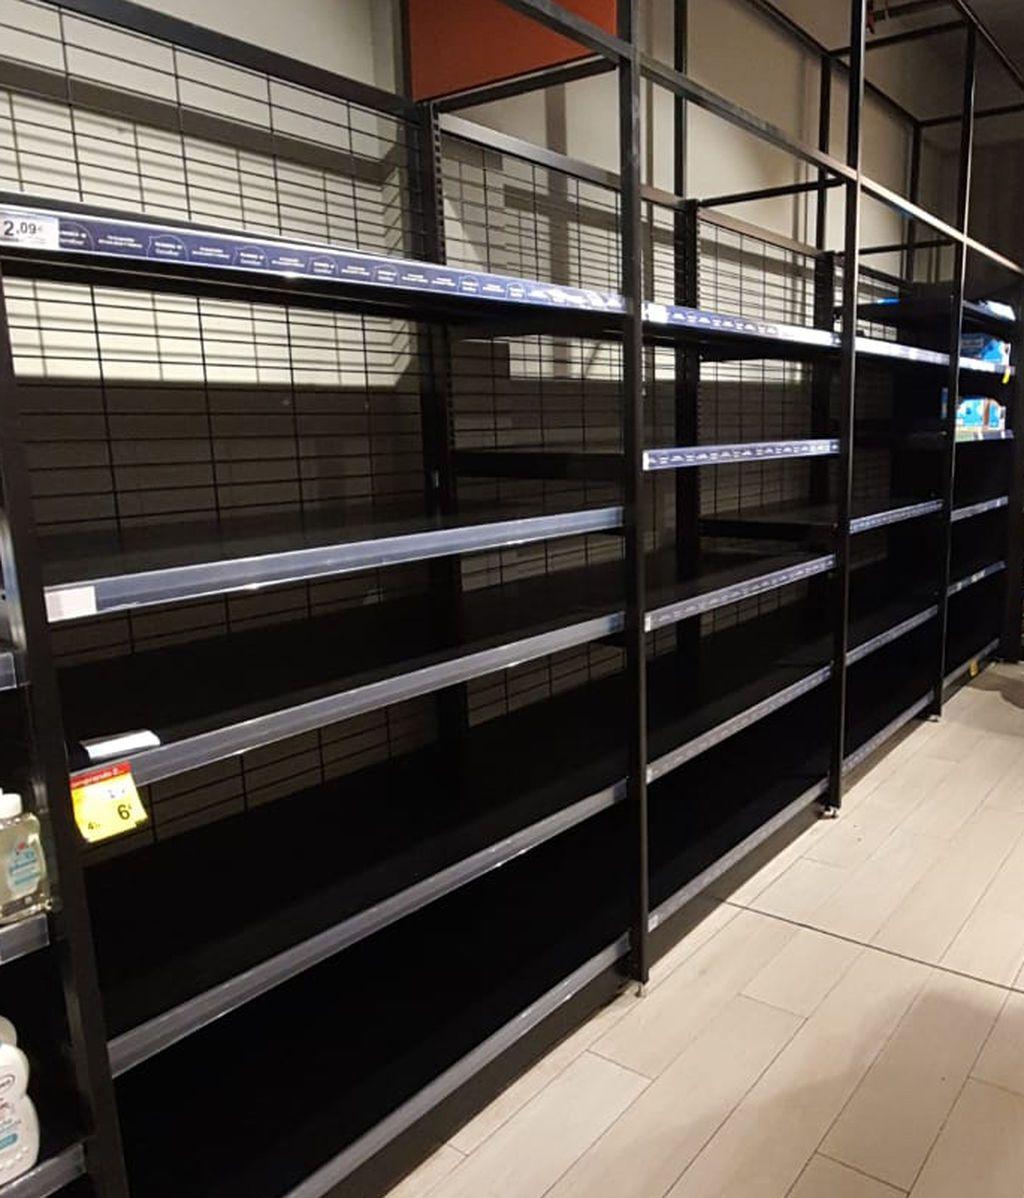 Estantería vacía en un supermercado